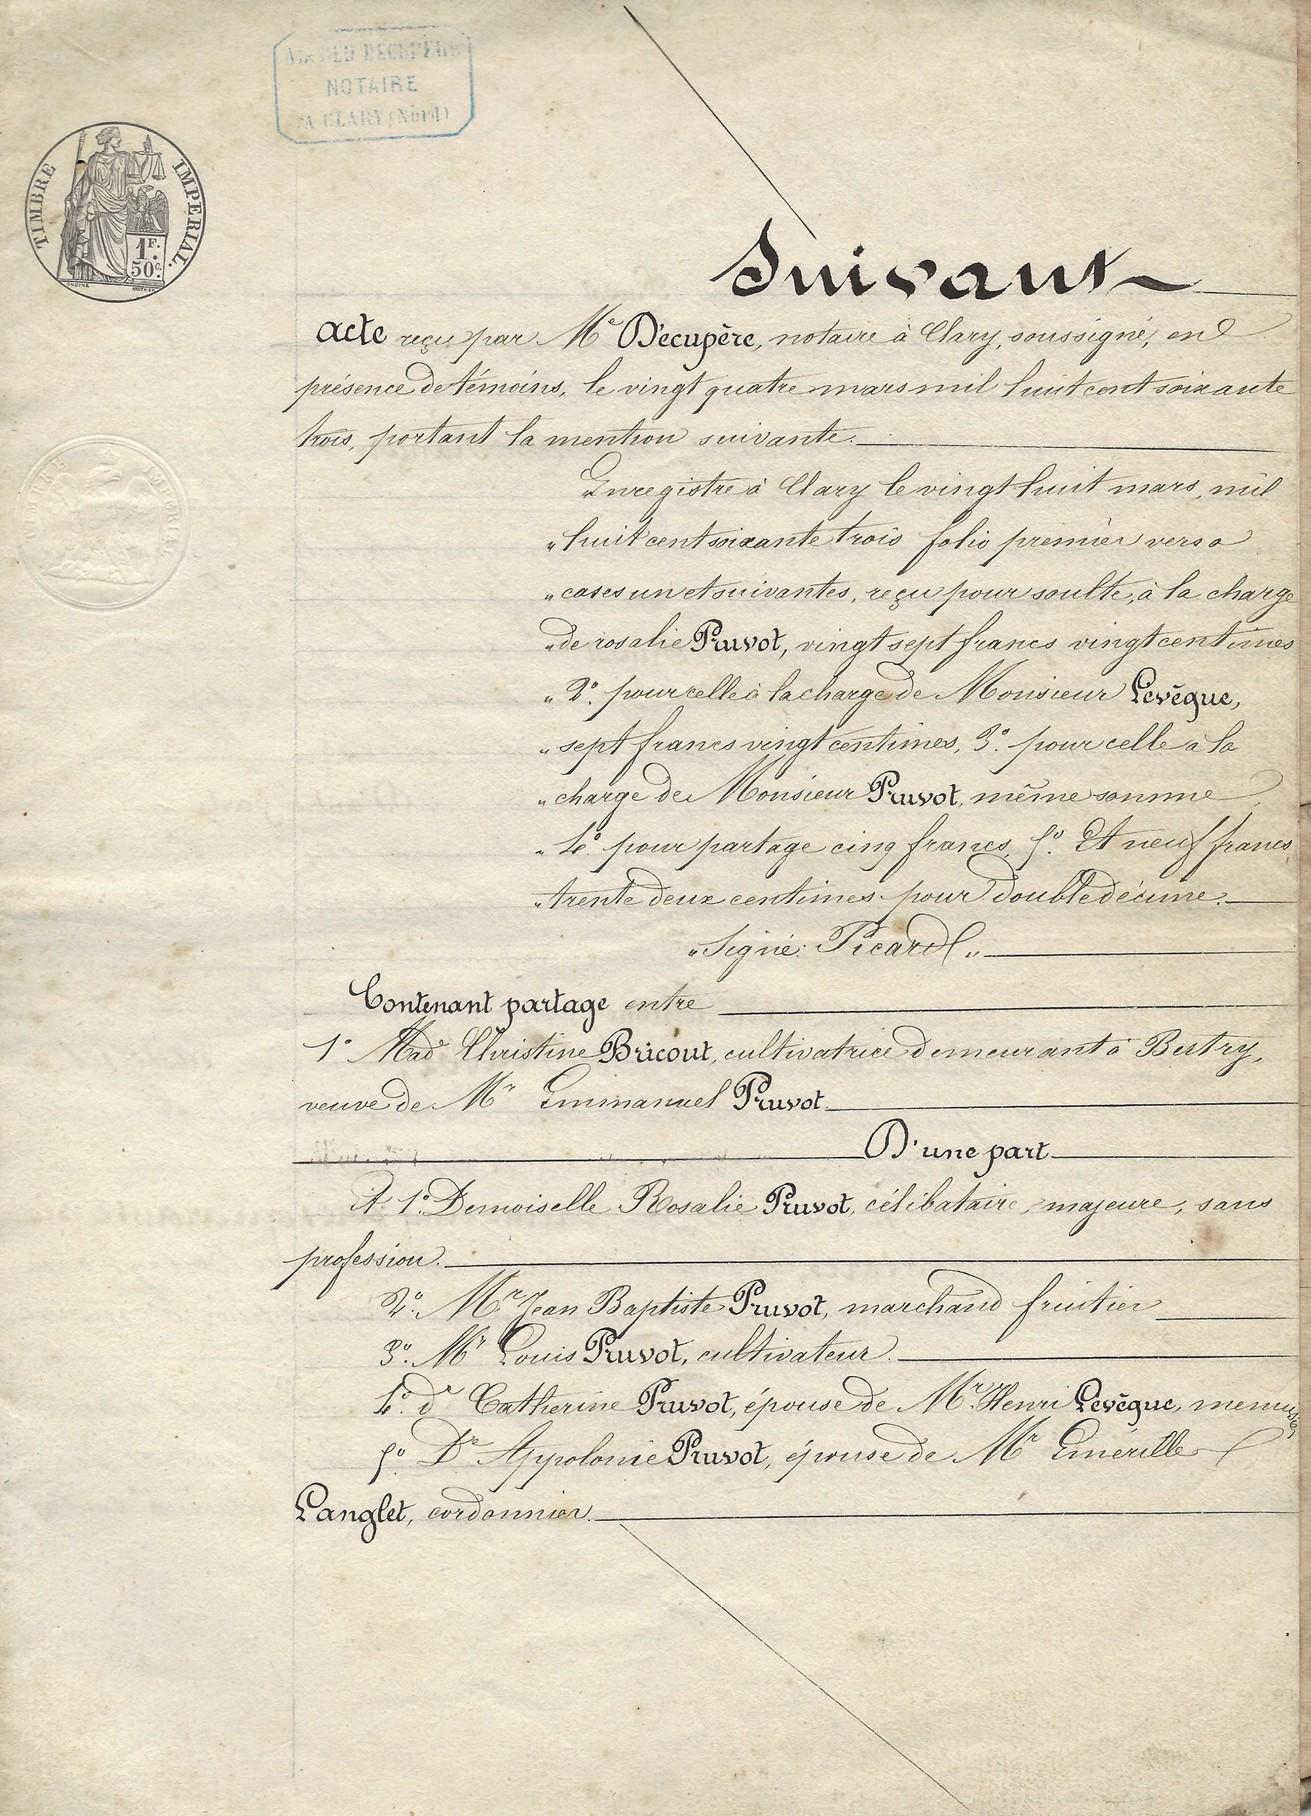 1863 partage ch bricout vve pruvot 001